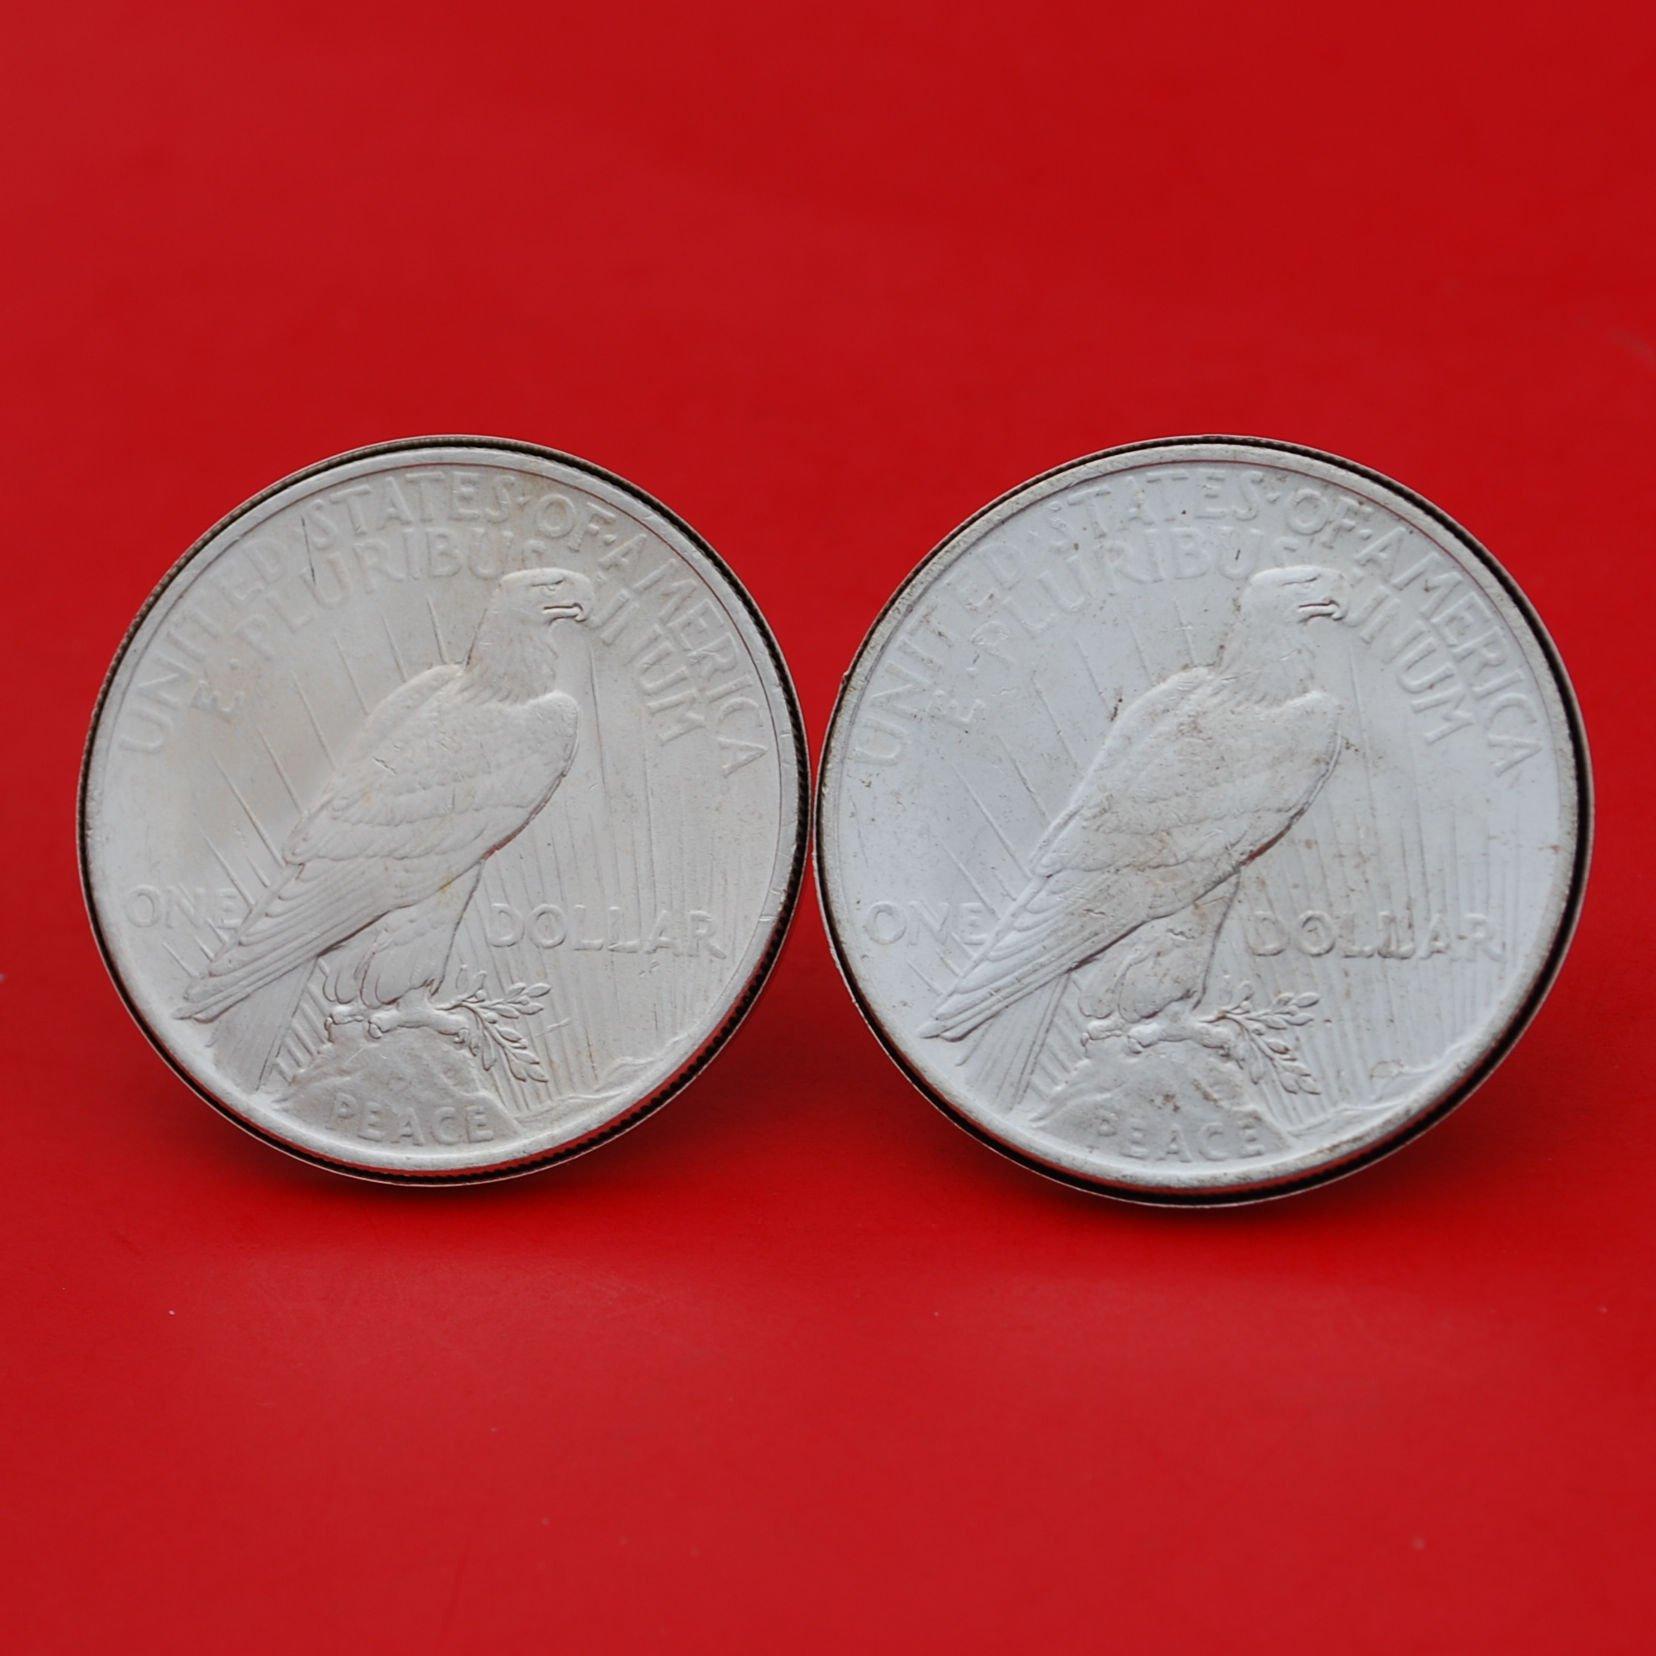 US 1922 Peace Silver Dollar BU Uncirculated Silver Cufflinks NEW - REVERSE + REVERSE